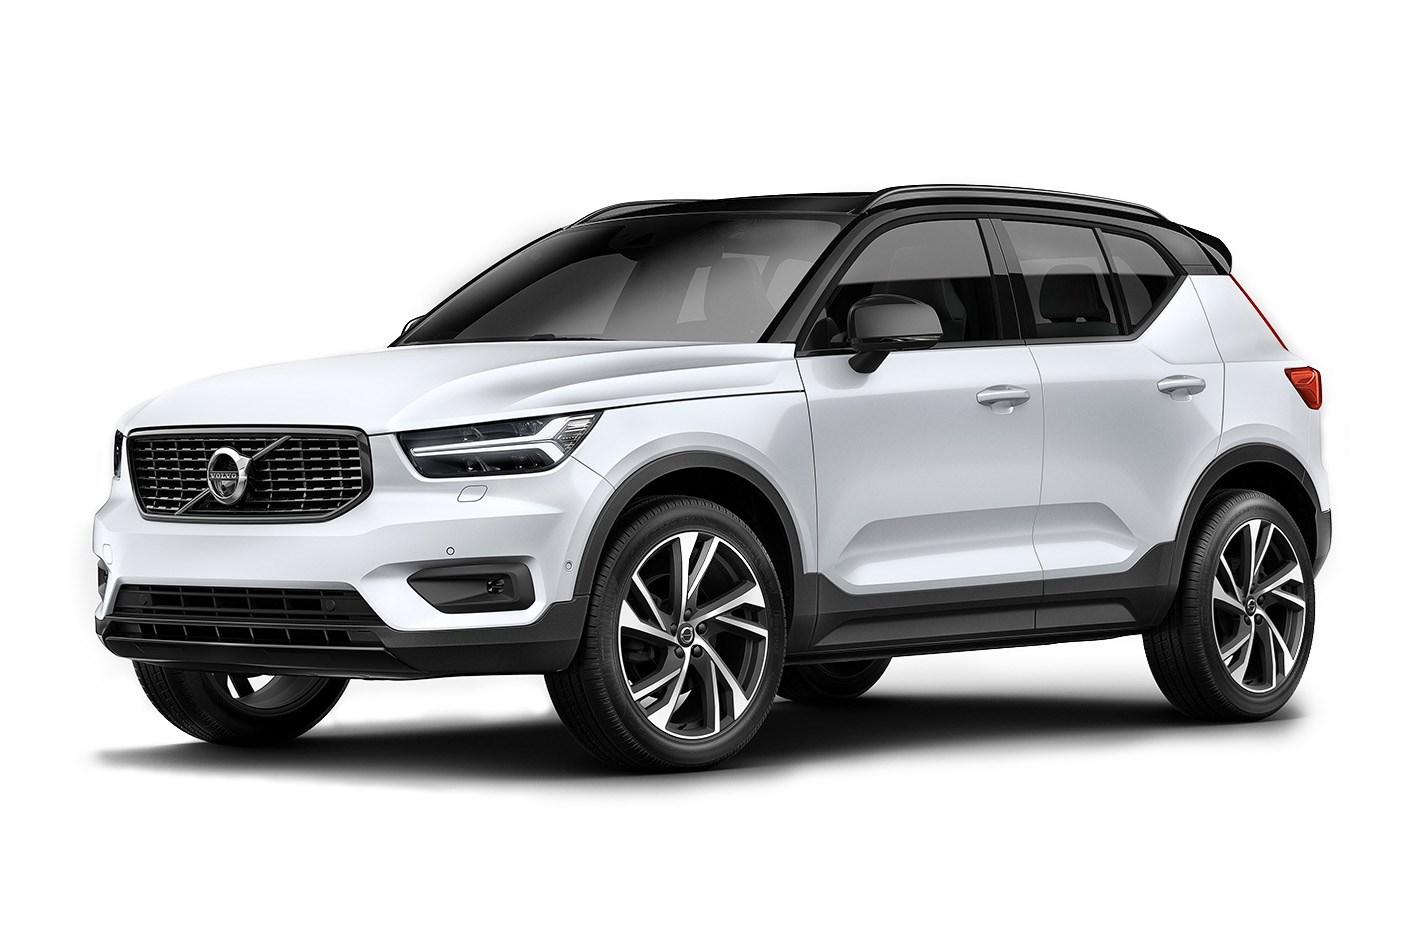 2018 Volvo XC40 T5 Momentum (AWD), 2.0L 5cyl Petrol Turbocharged Automatic,  SUV